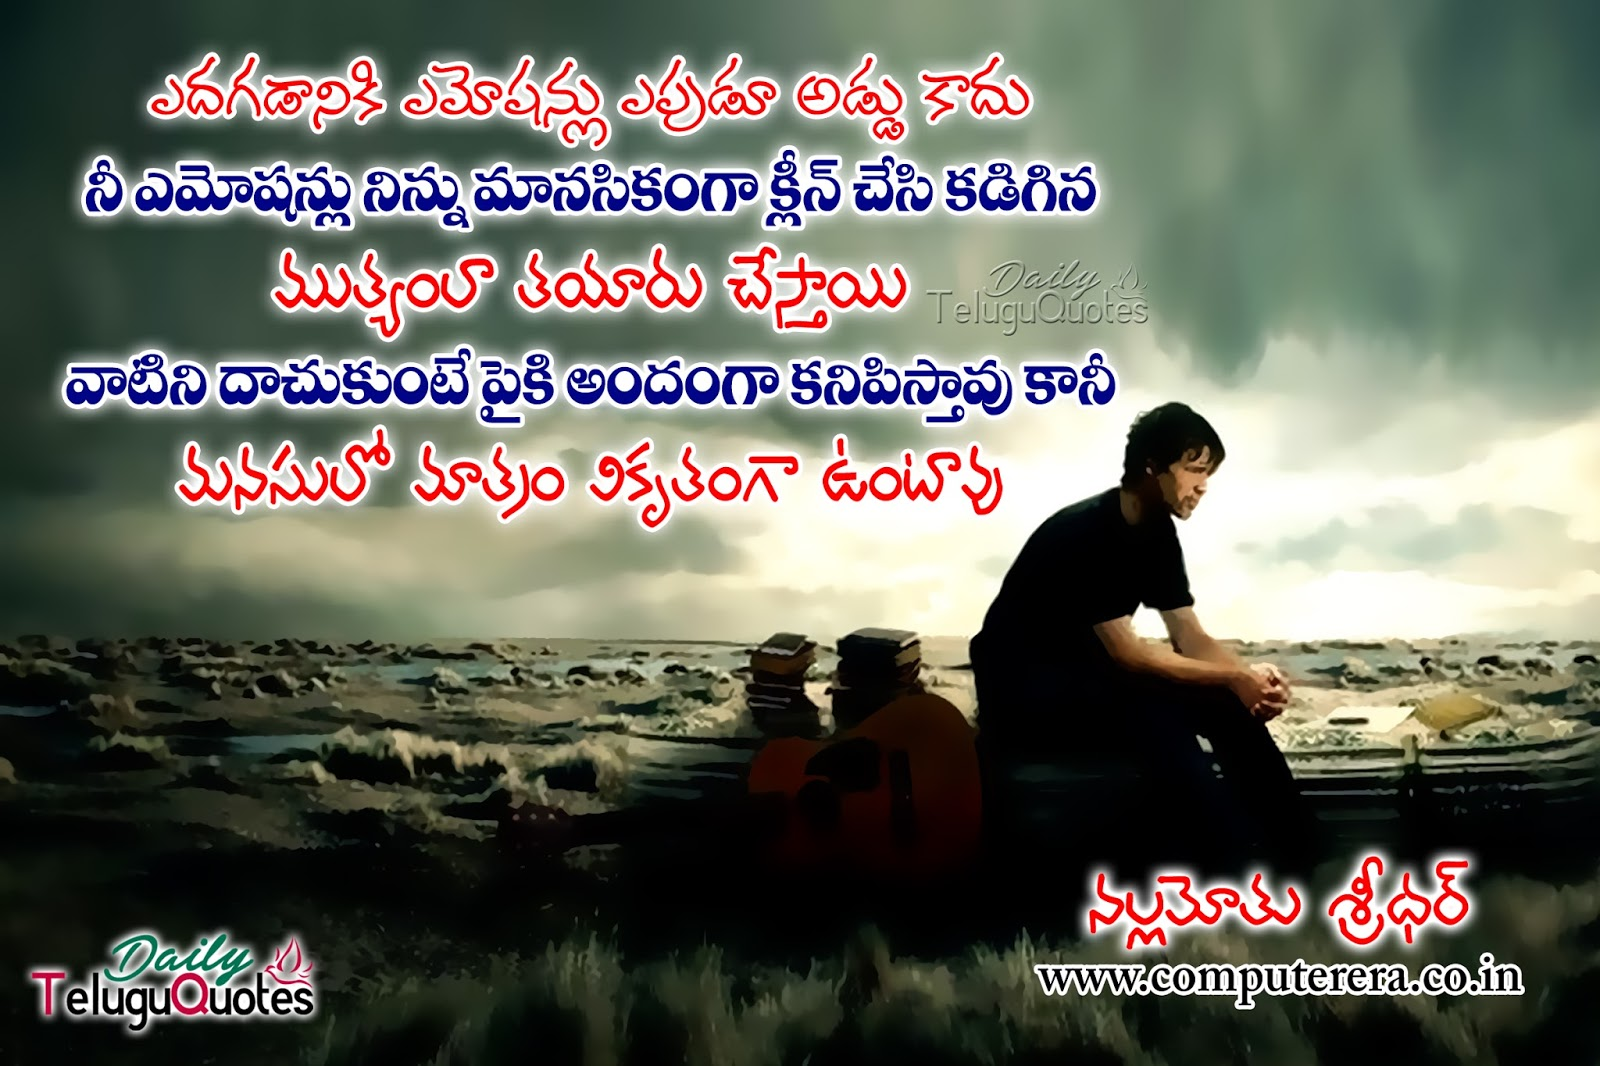 Motivational Quotes In Kannada Language - Sacin Quotes